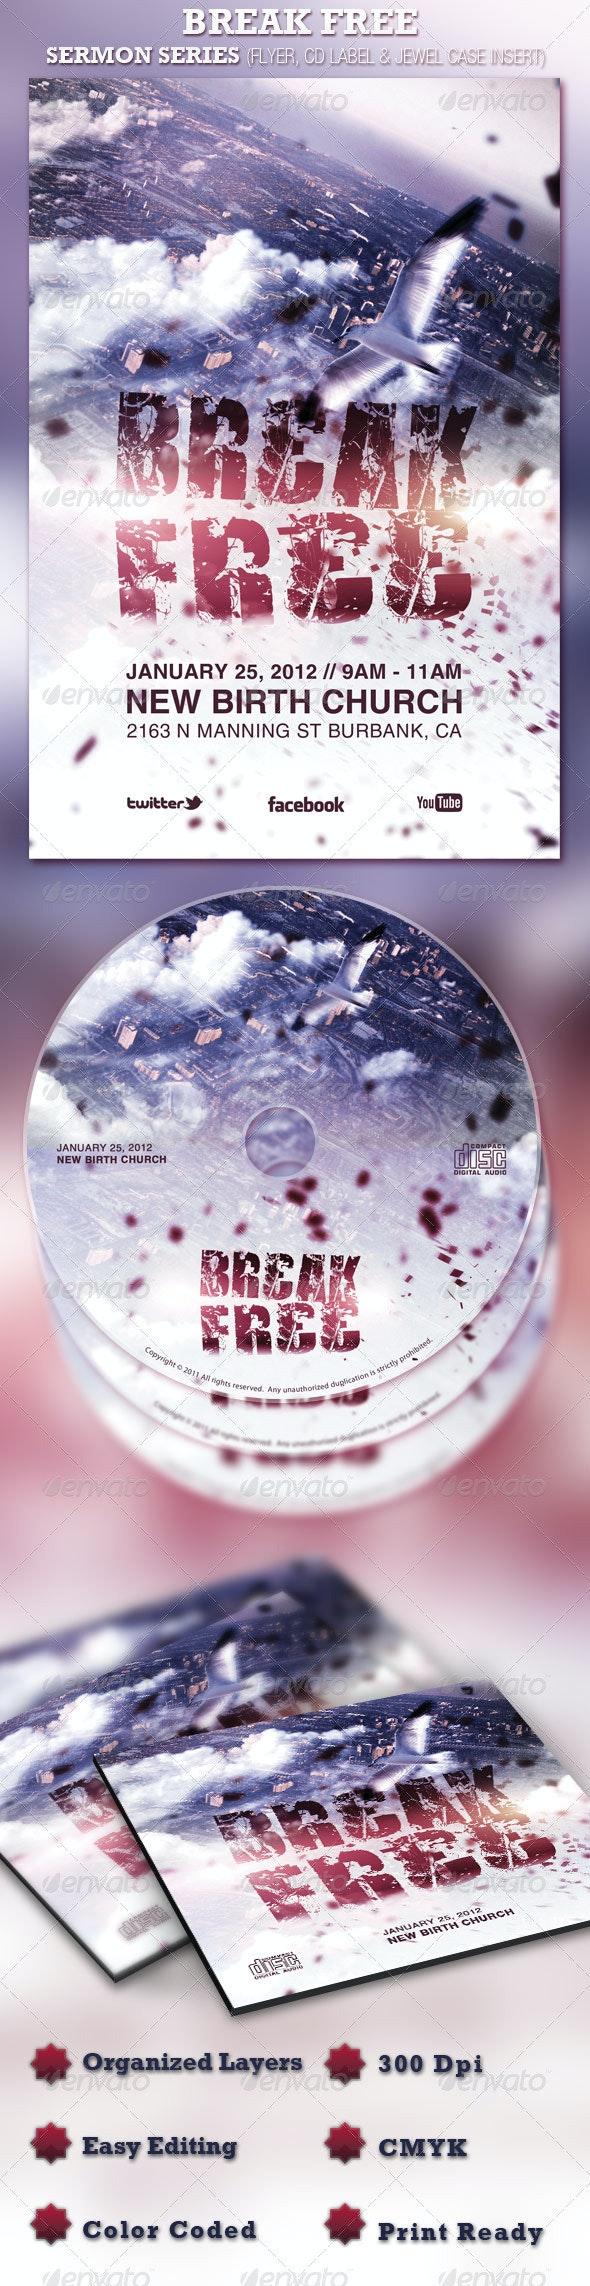 Break Free Church Flyer and CD Template - Church Flyers